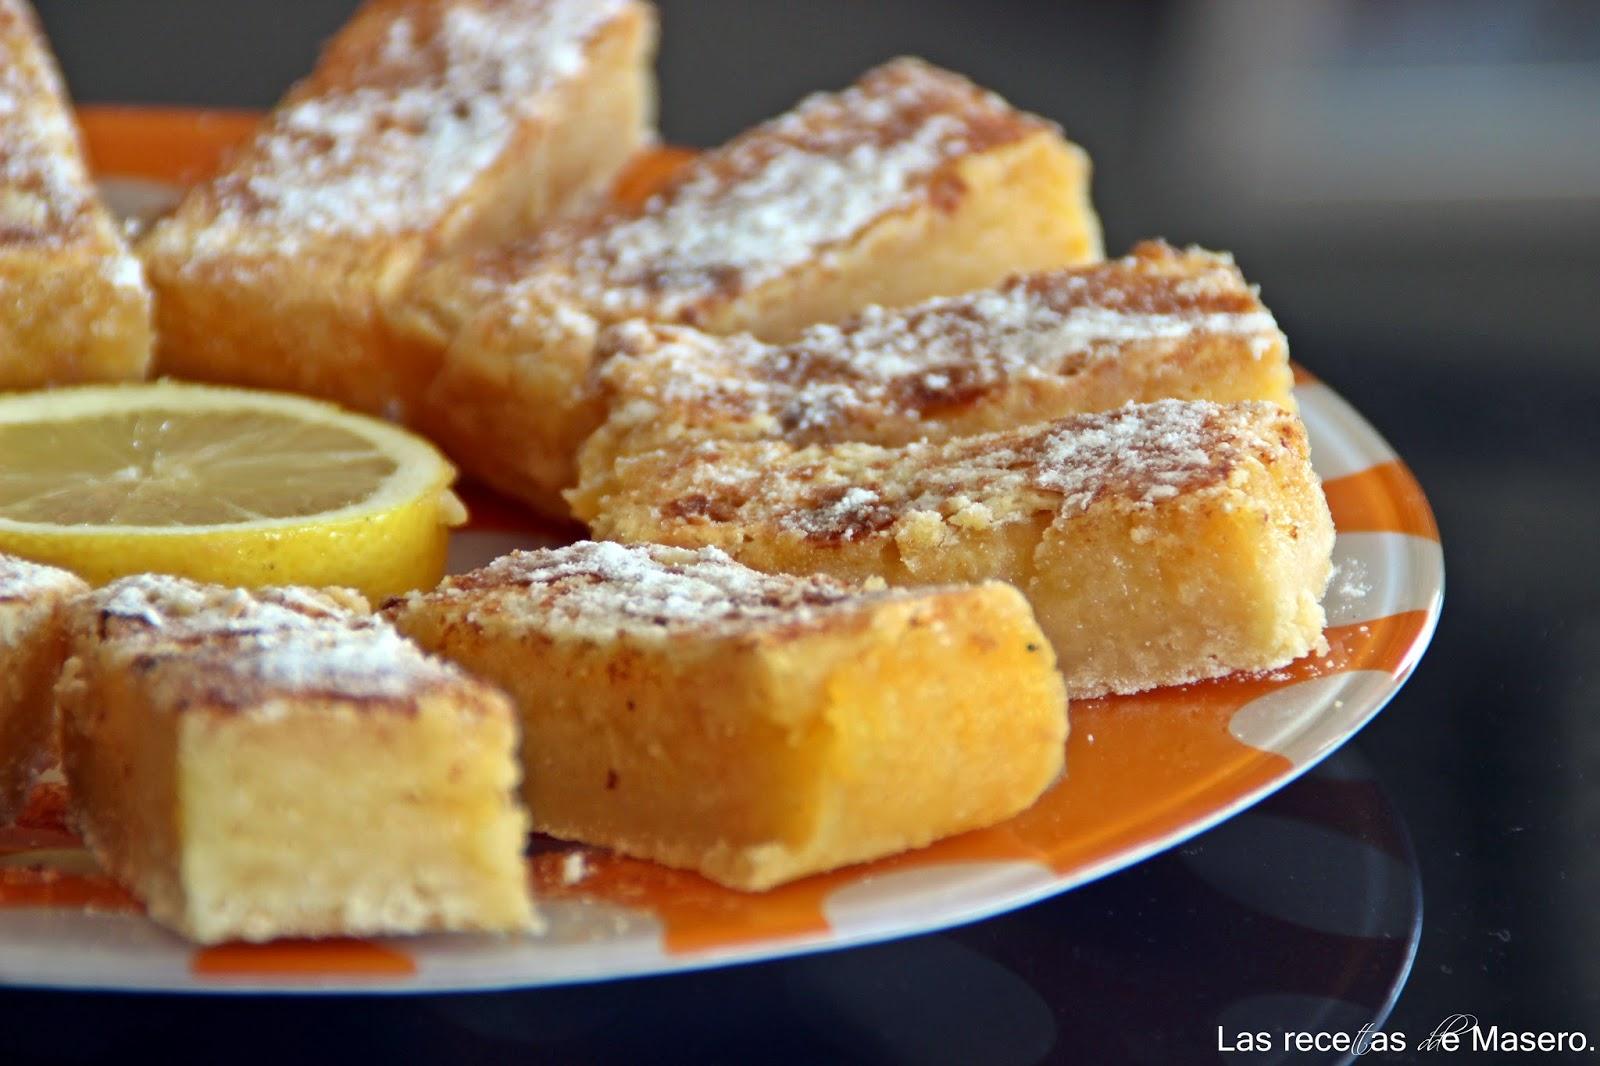 Barritas De Limón (lemon Bars)